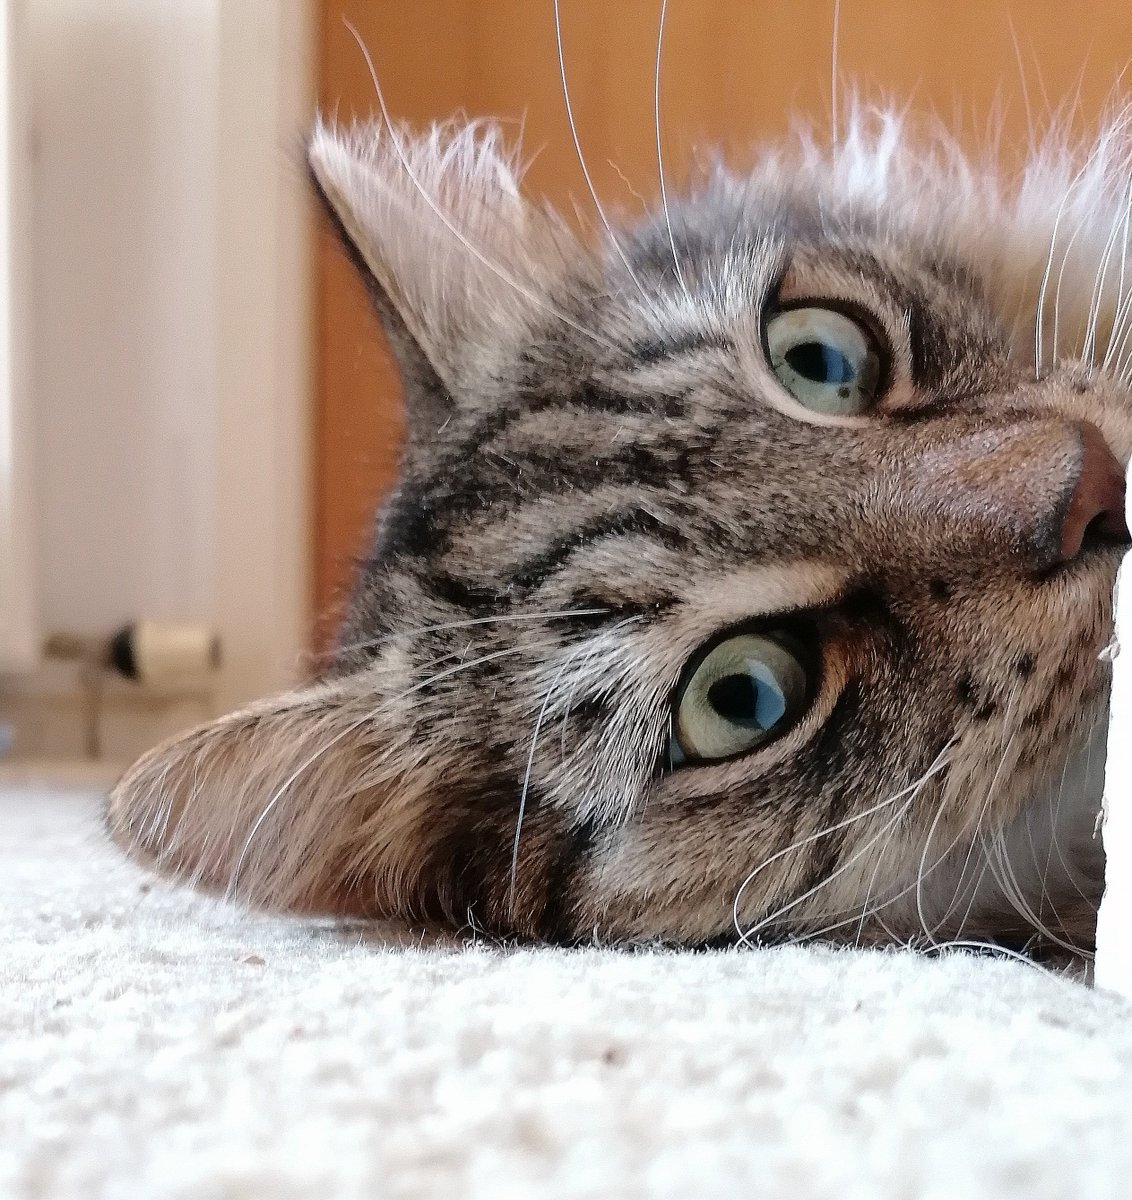 Tufts of fluff ⛲ #fluffyfursday #catsoftwitter https://t.co/49MO3Zm5Tf